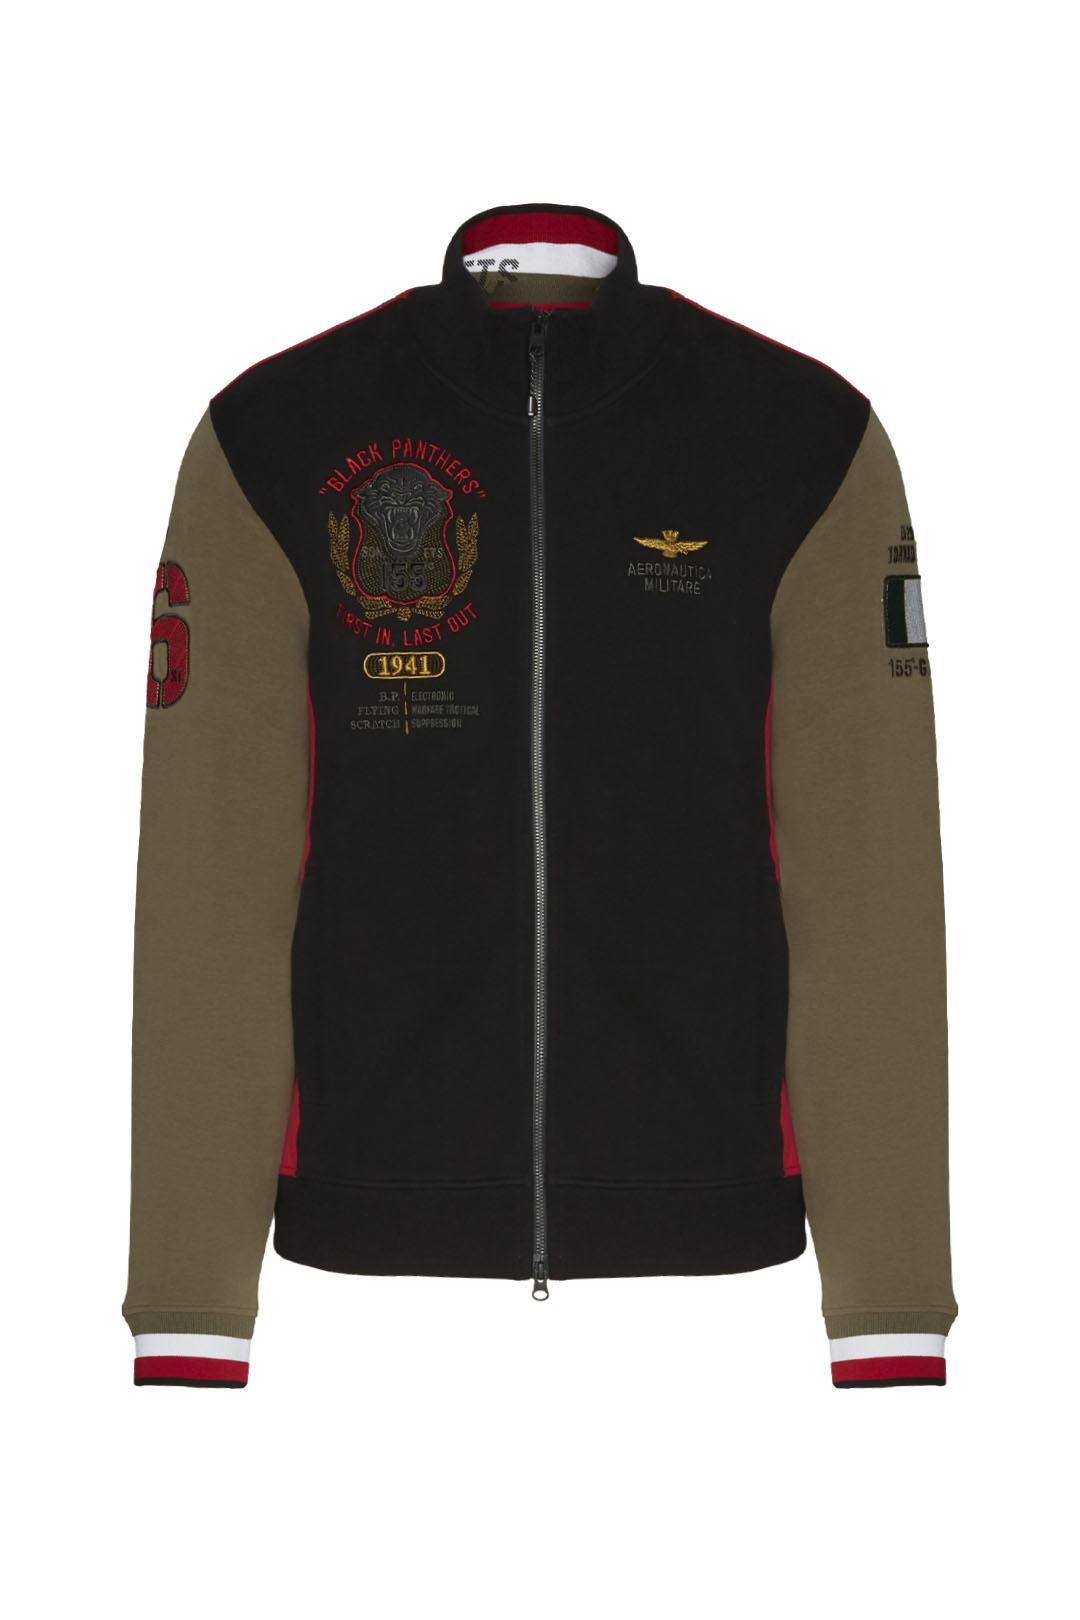 Sweatshirt 155th Group Black Panthers